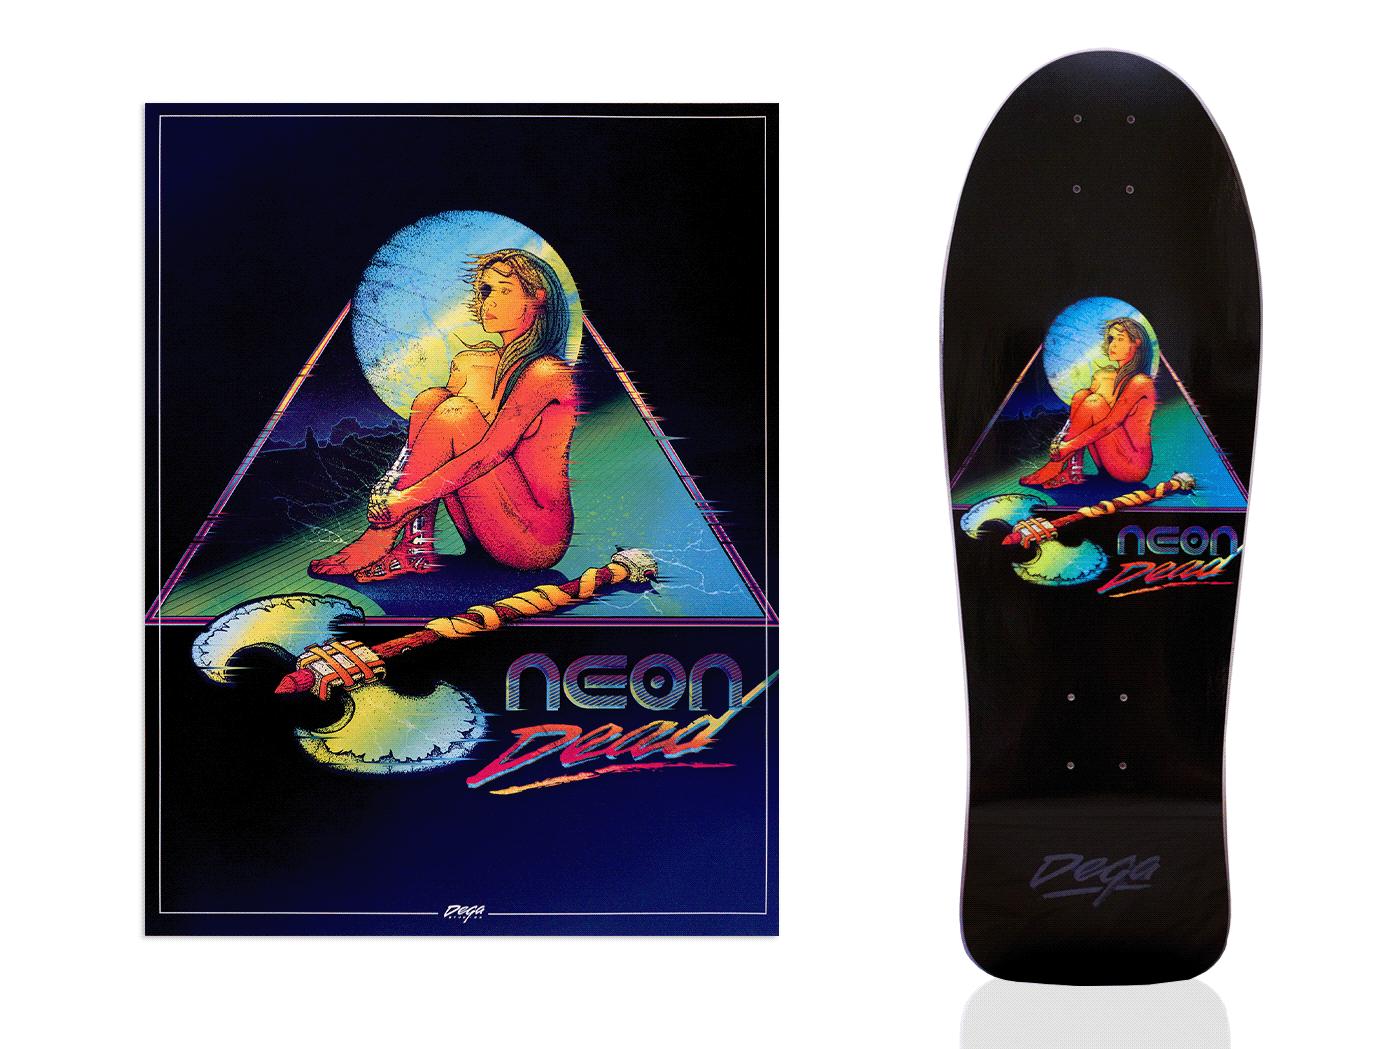 Neon Dead